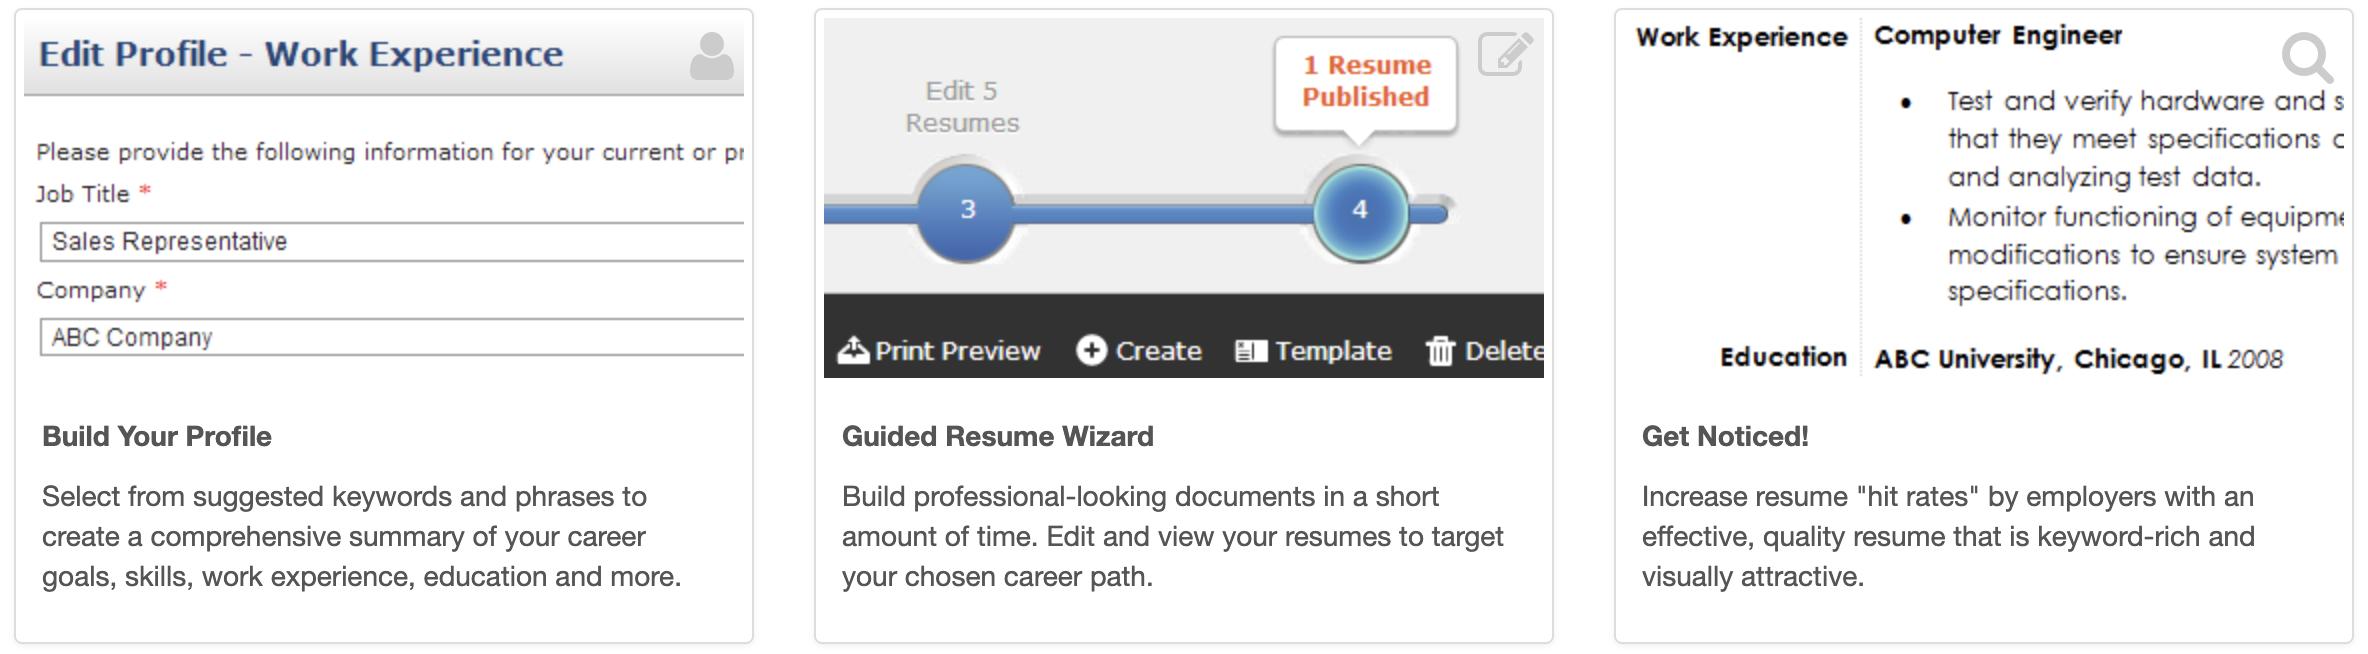 resume hero options screen capture